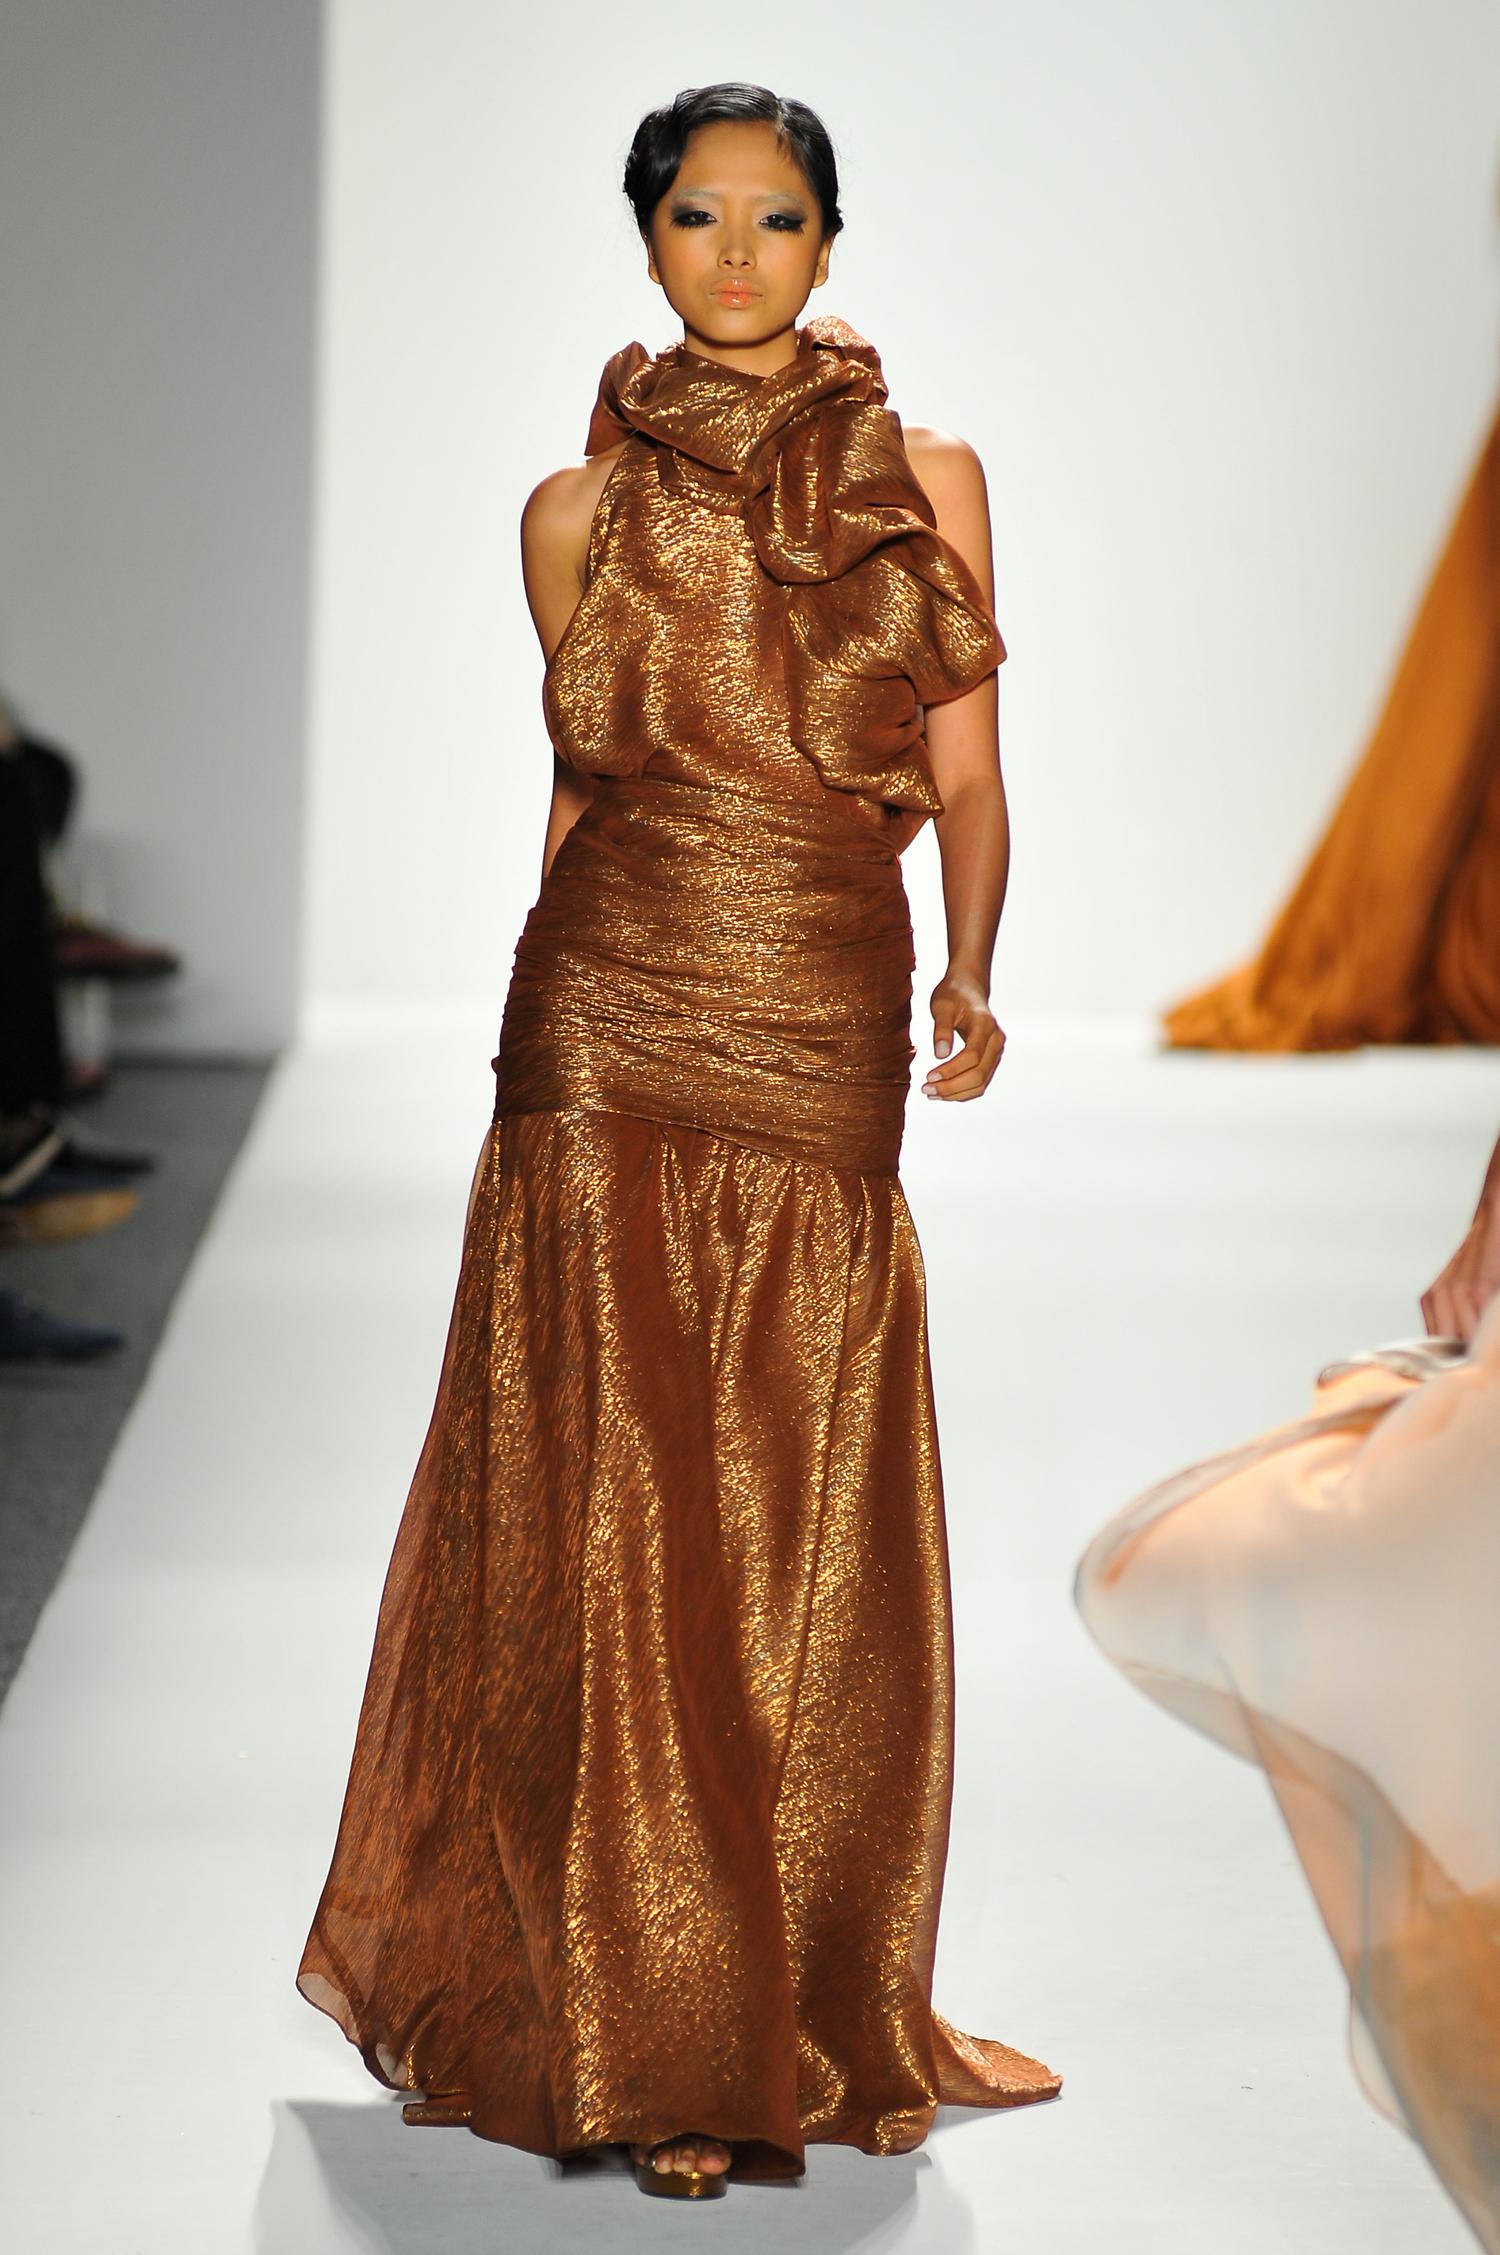 Bronze Silk Chiffon Metallic Evening Gown — Globa Moda